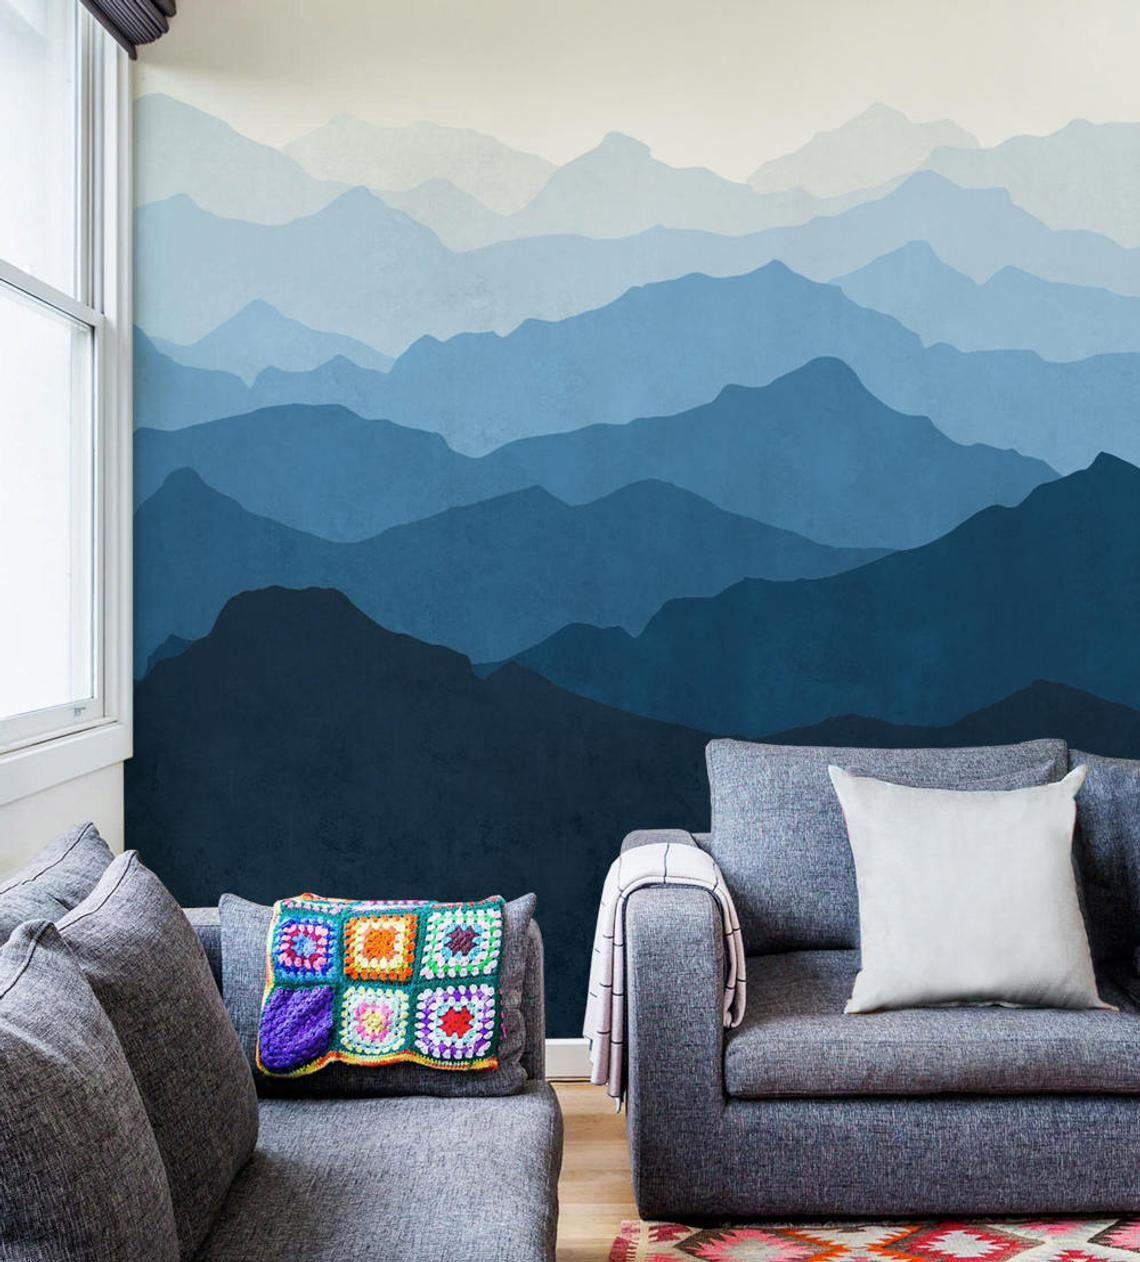 Fond d'écran mural de montagne bleu d'océan ombre Etsy